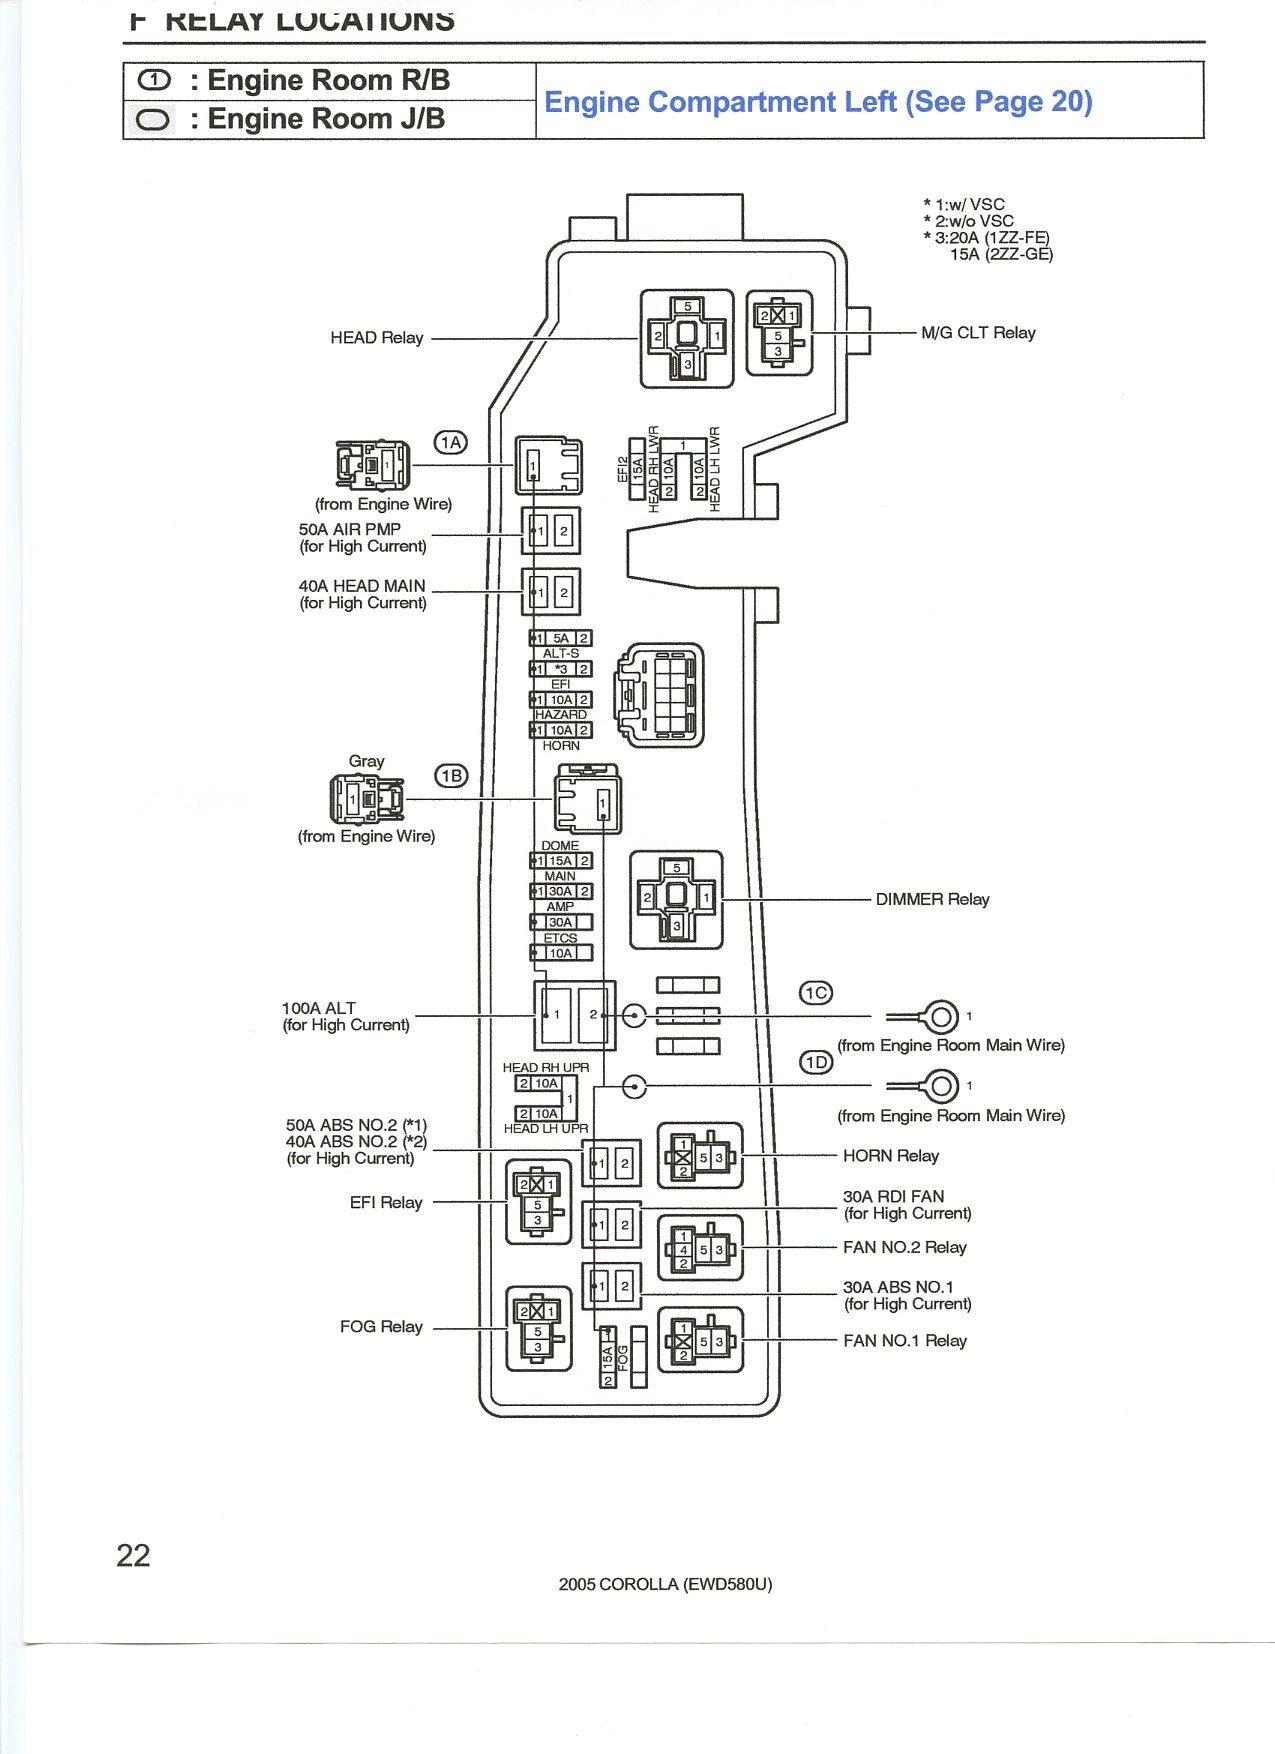 Ol 0869 Window Wiring Diagram Besides 2005 Toyota Corolla Fuse Box Diagram Download Diagram